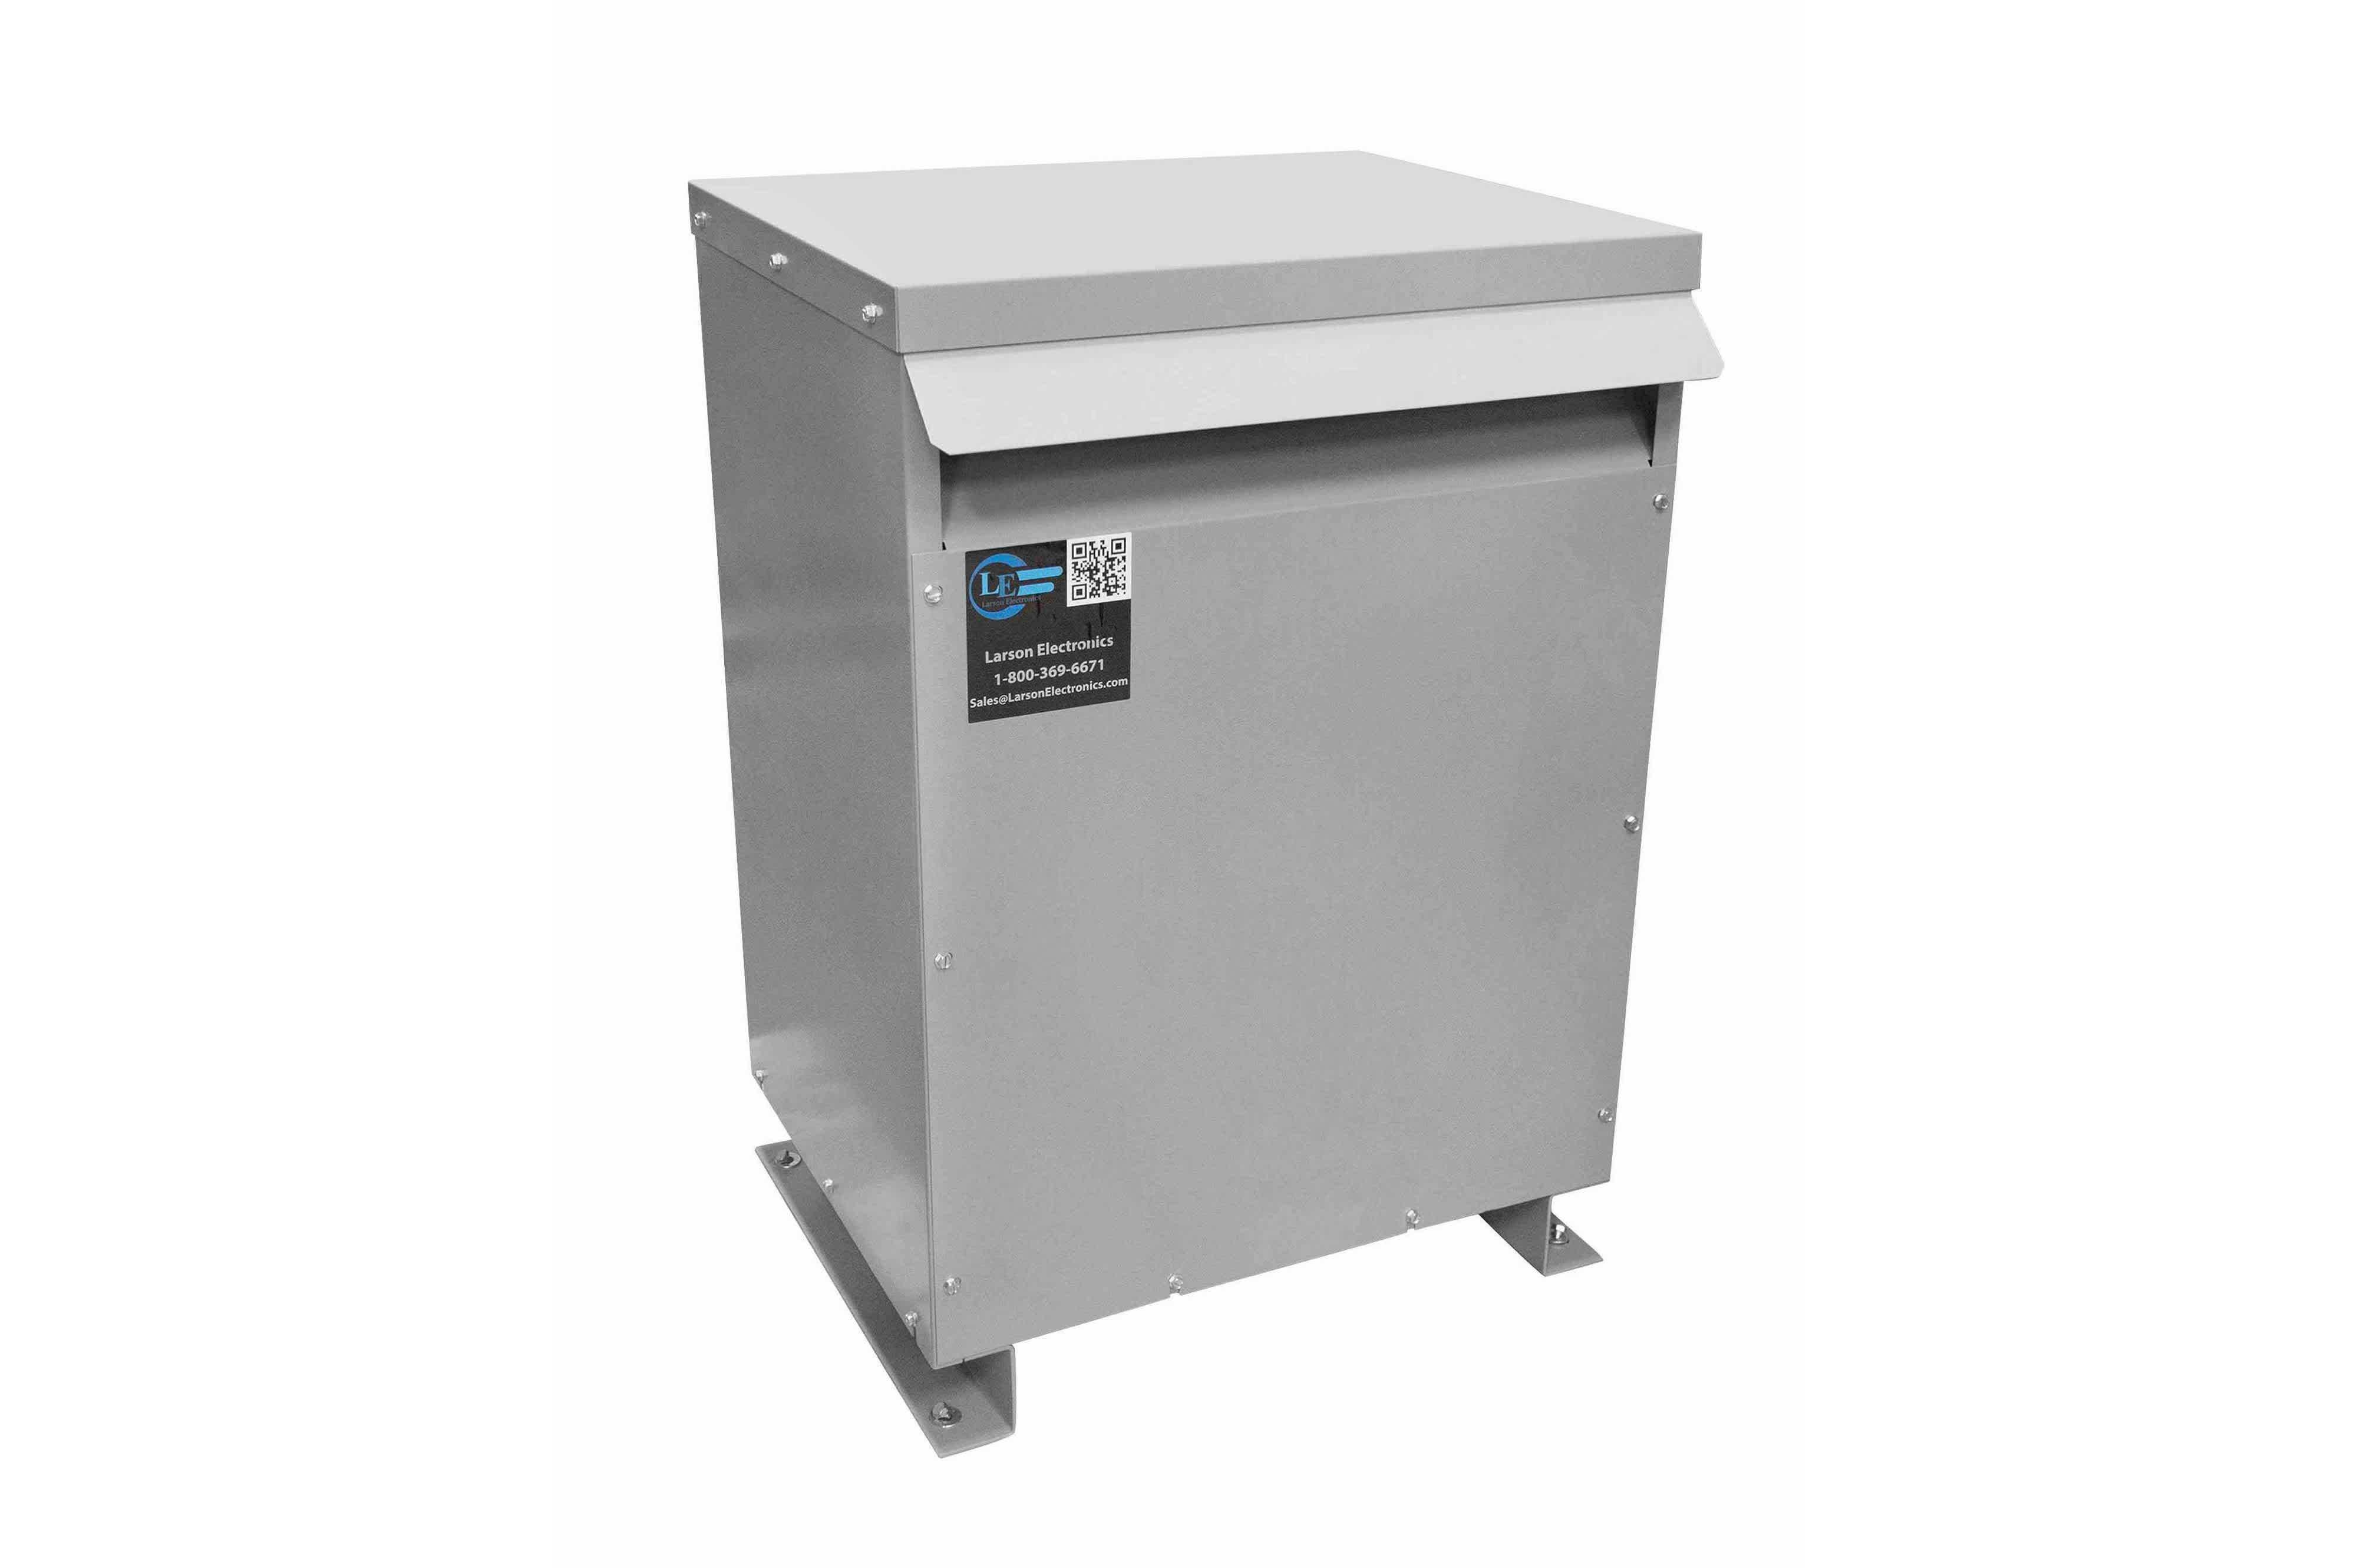 35 kVA 3PH Isolation Transformer, 415V Wye Primary, 480Y/277 Wye-N Secondary, N3R, Ventilated, 60 Hz